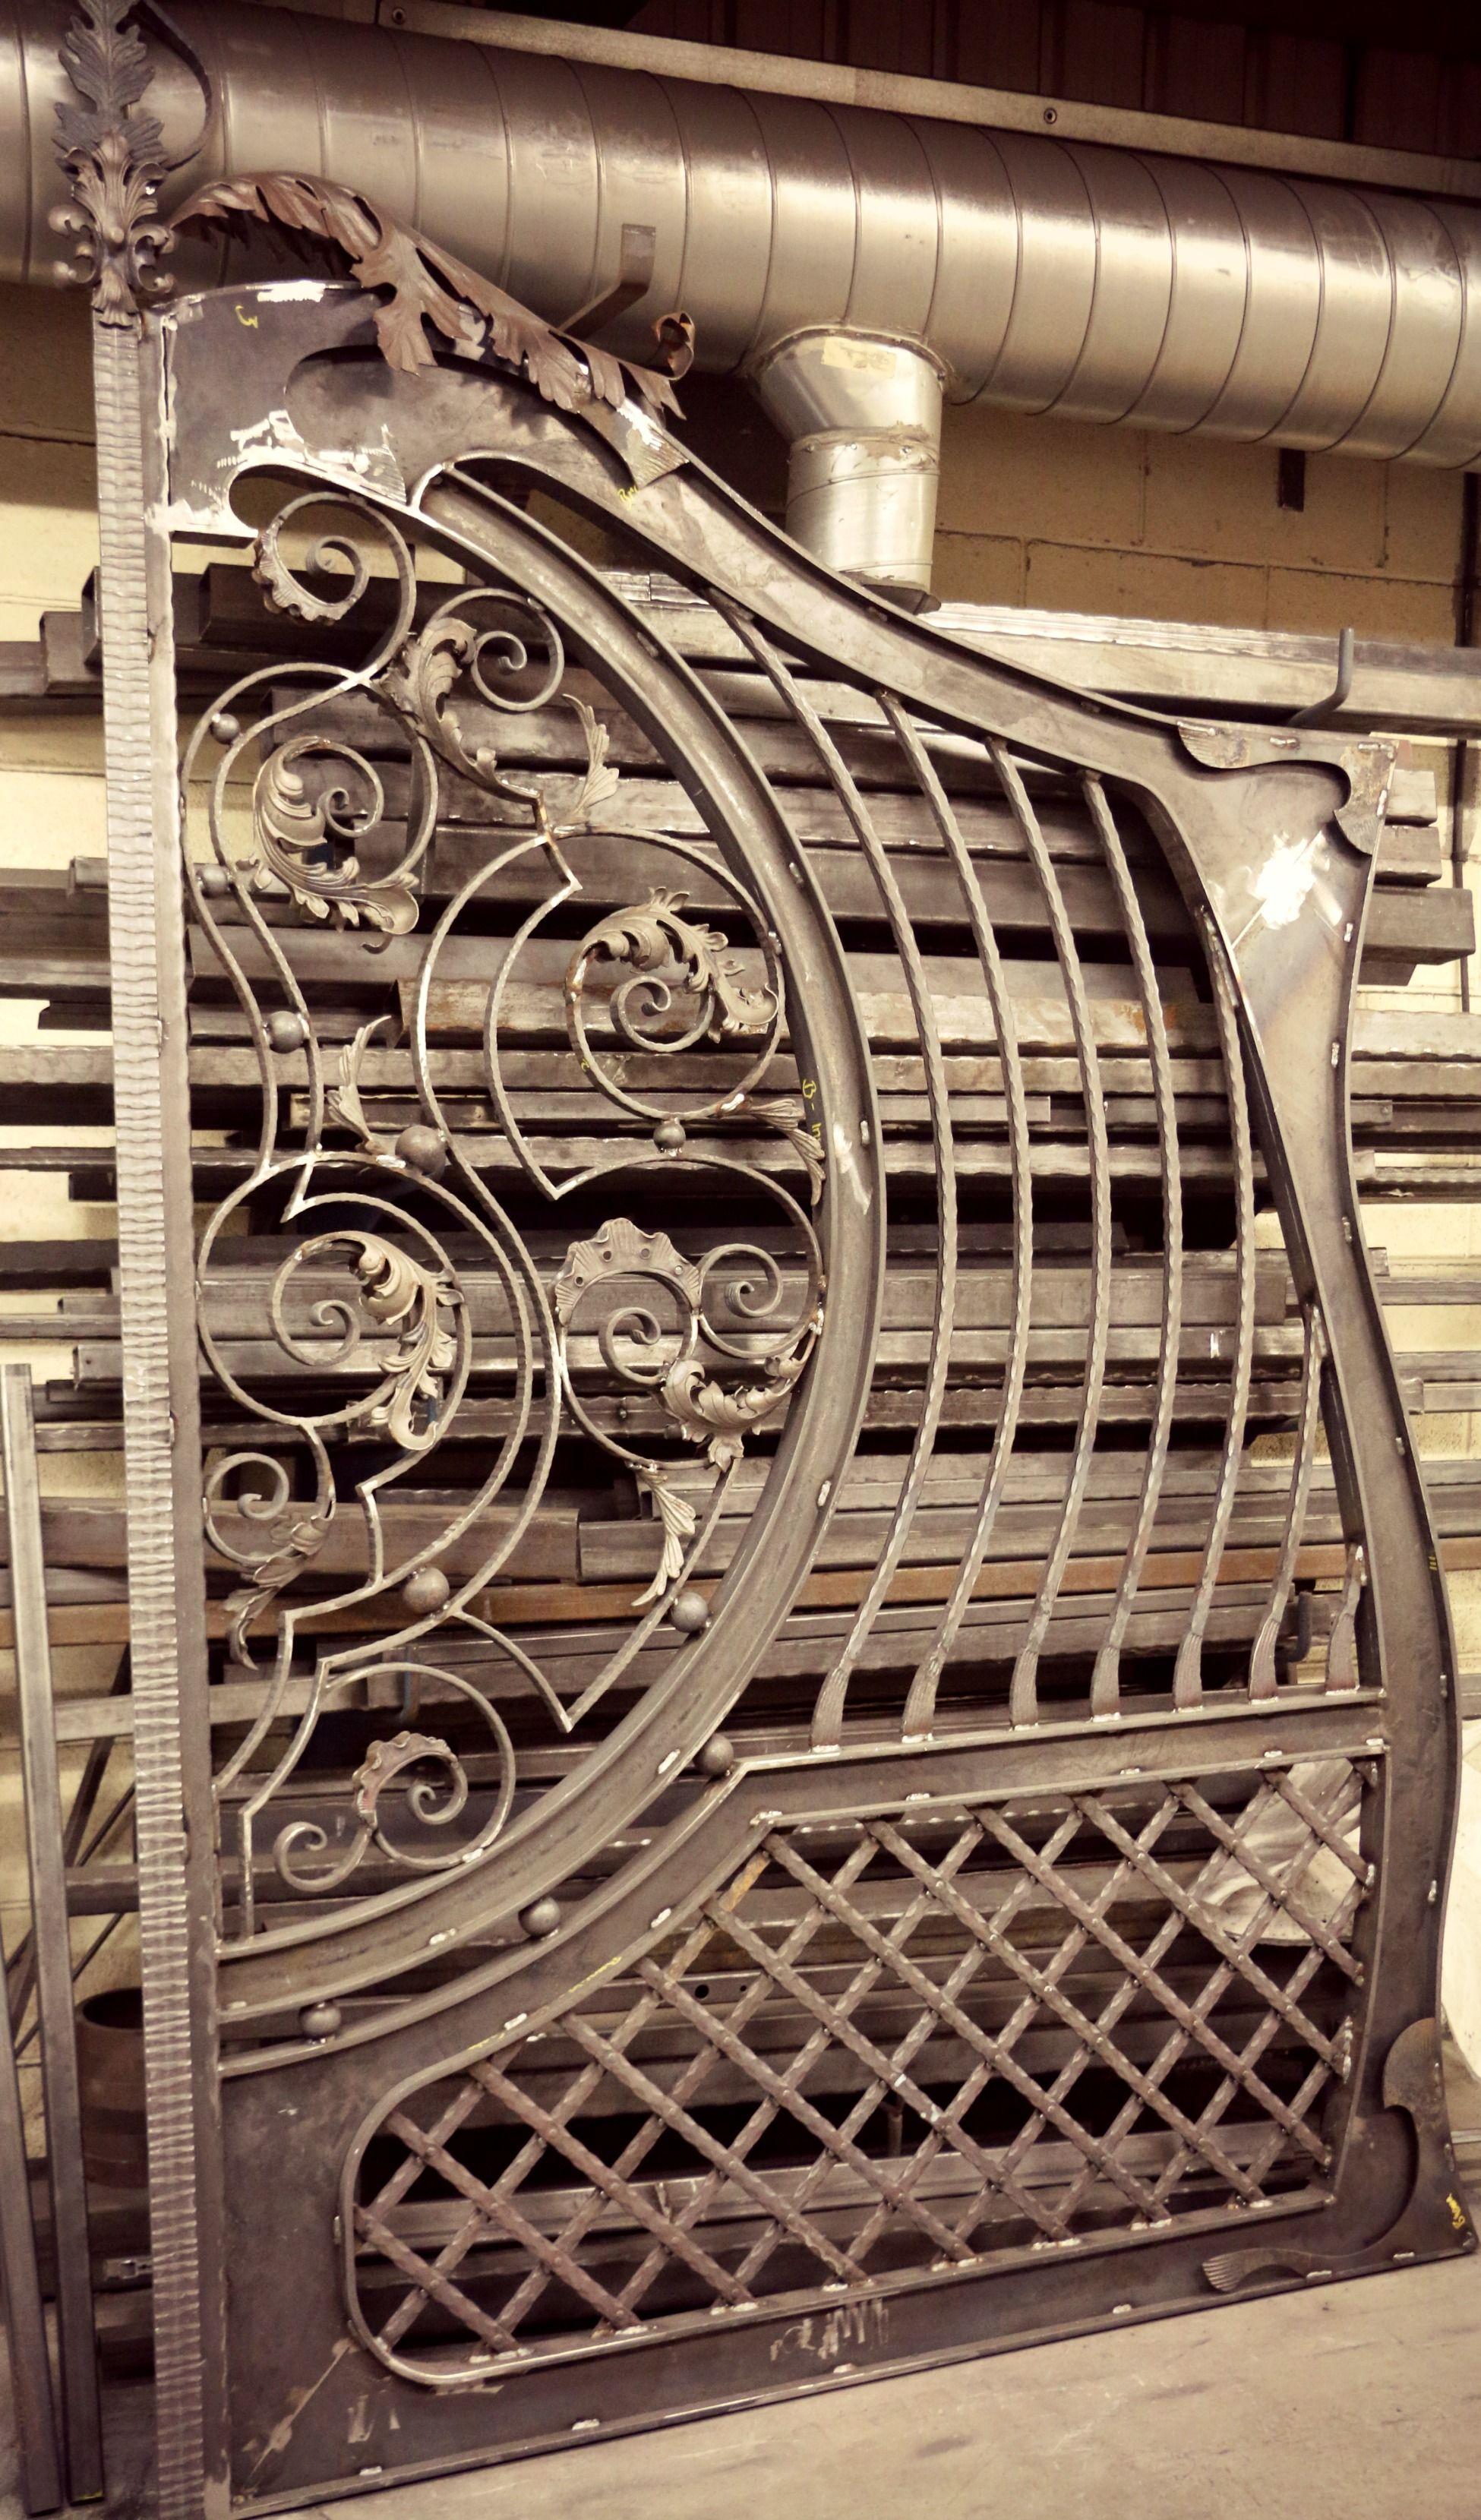 Pin by Андрей Ибрагимов on Ворота | Pinterest | Gates, Pedestrian ...